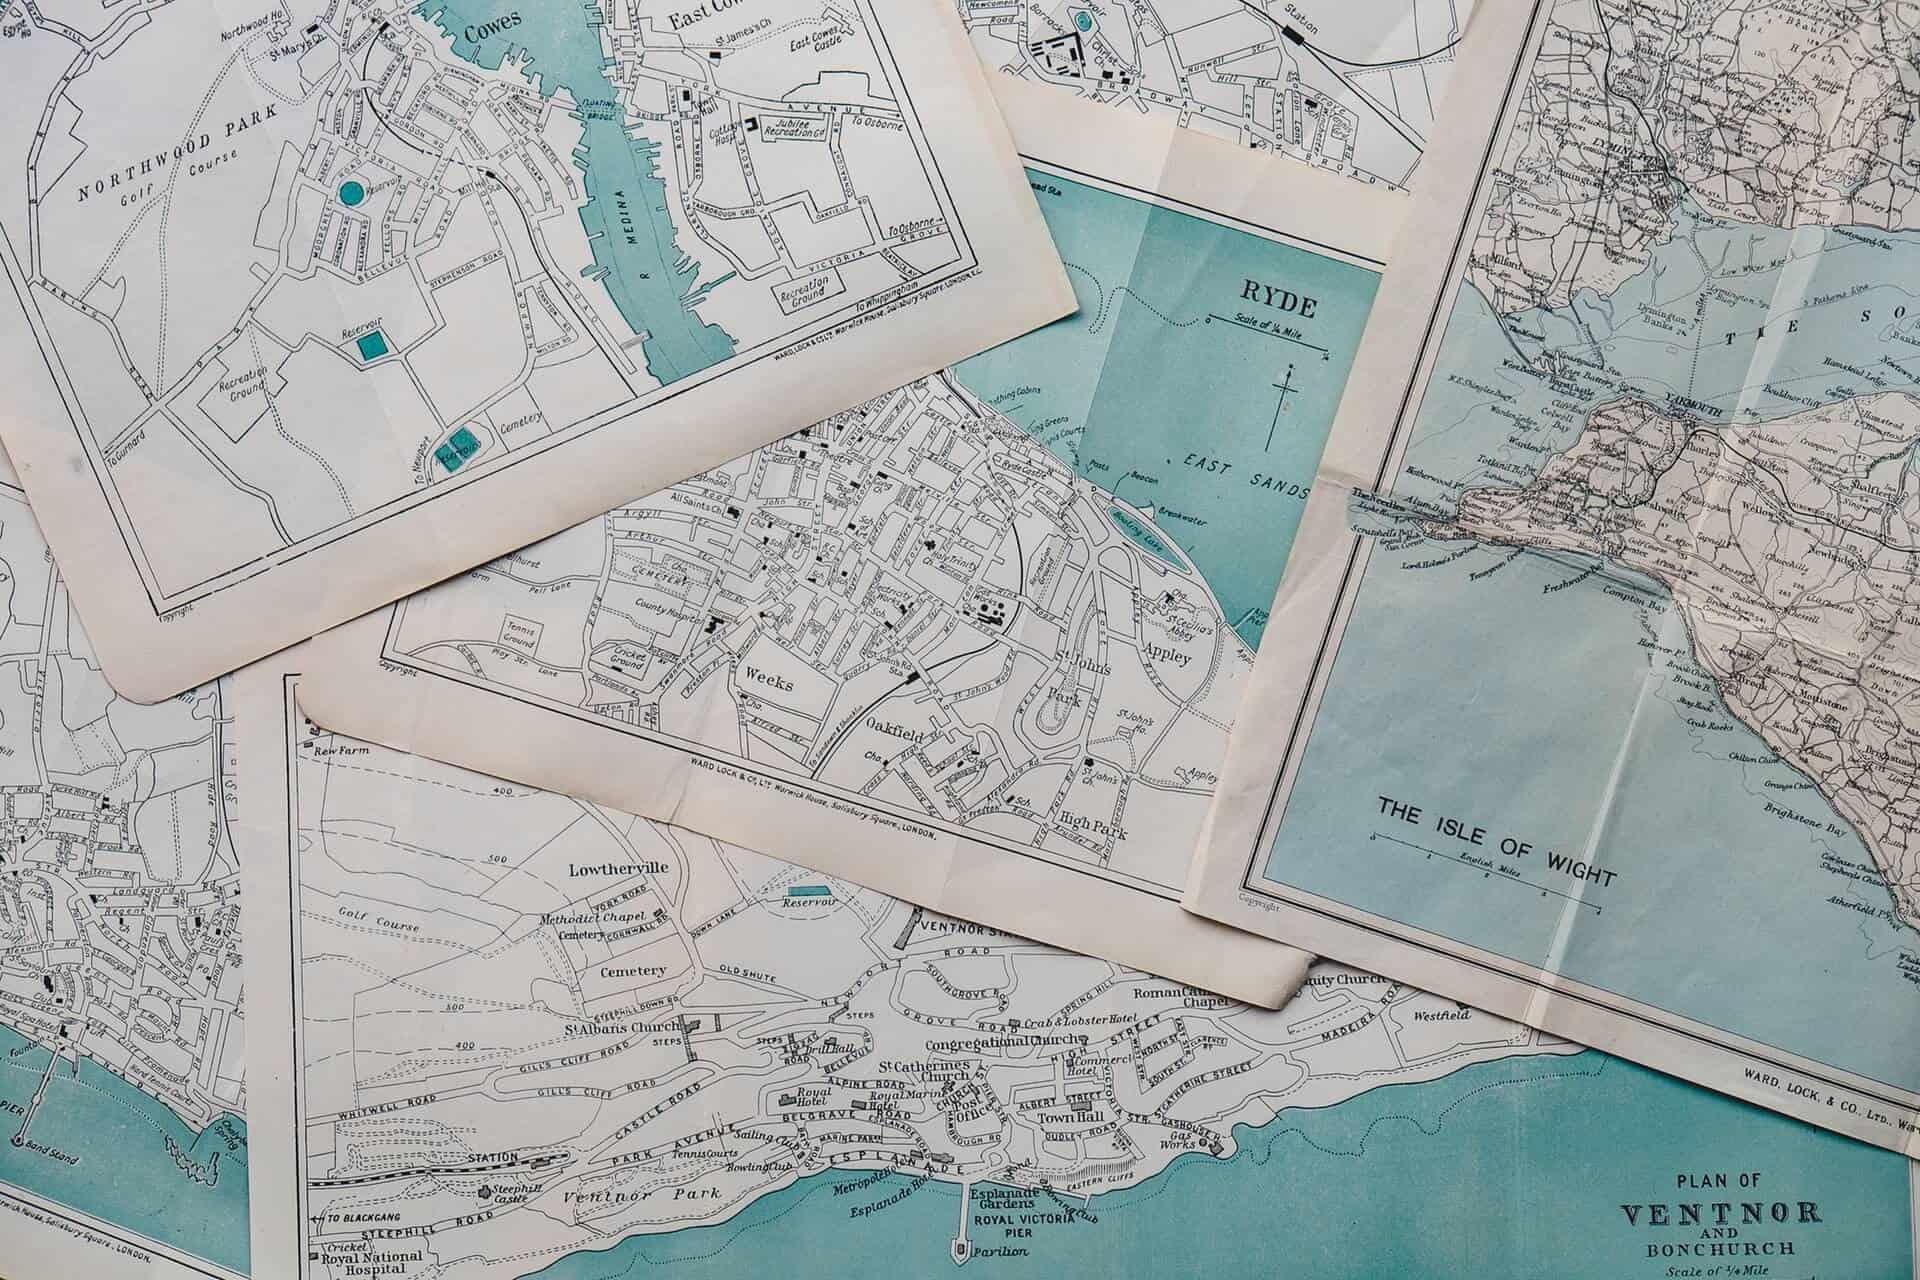 Landkarten (Maps)